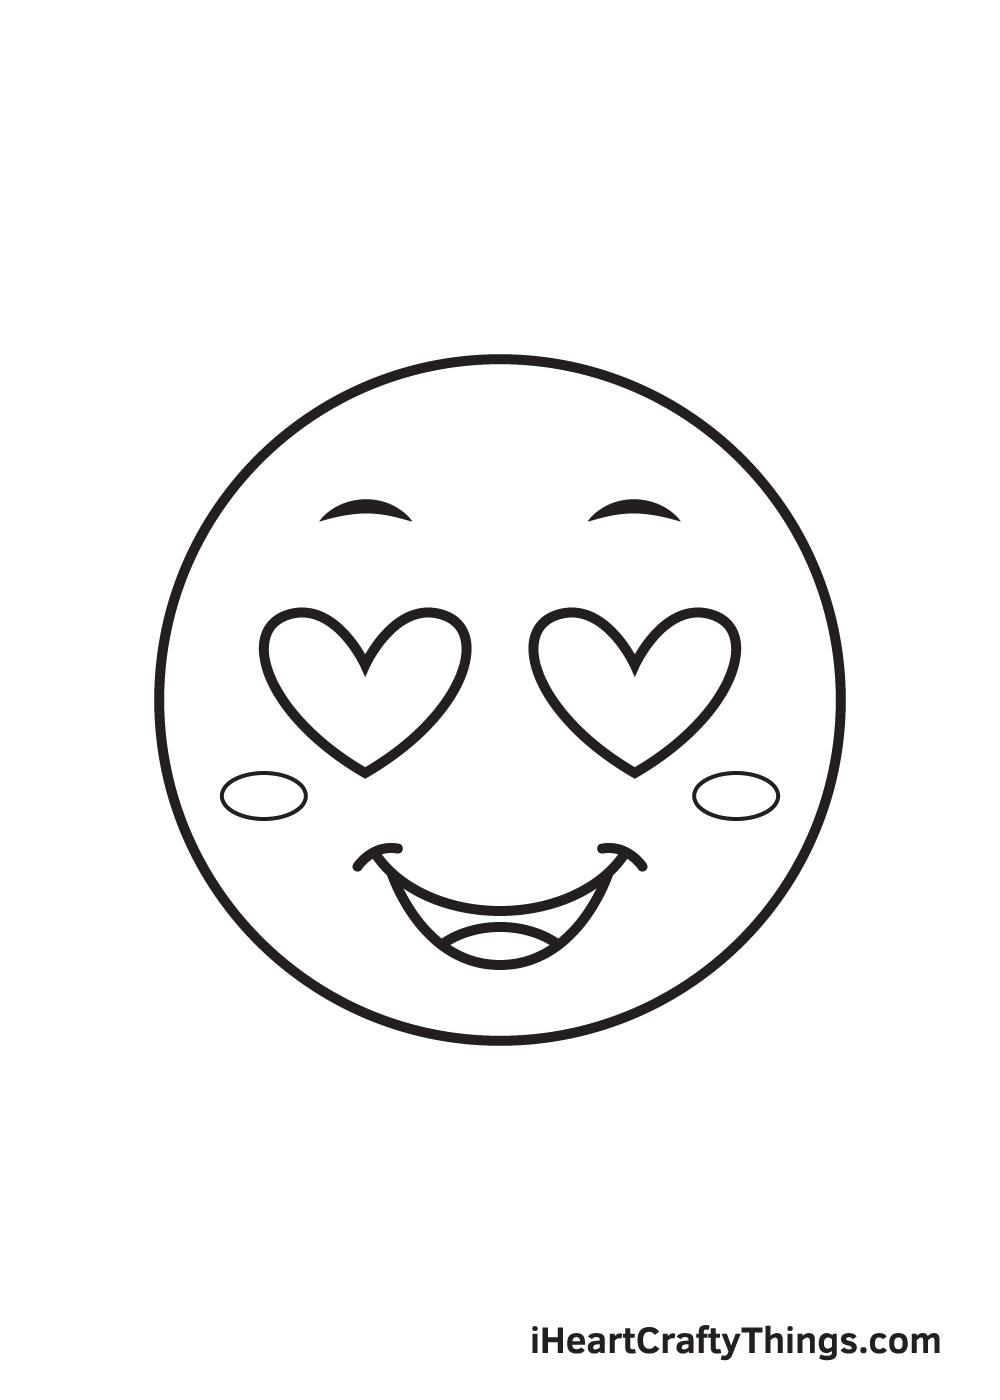 Emojis Drawing – Step 9